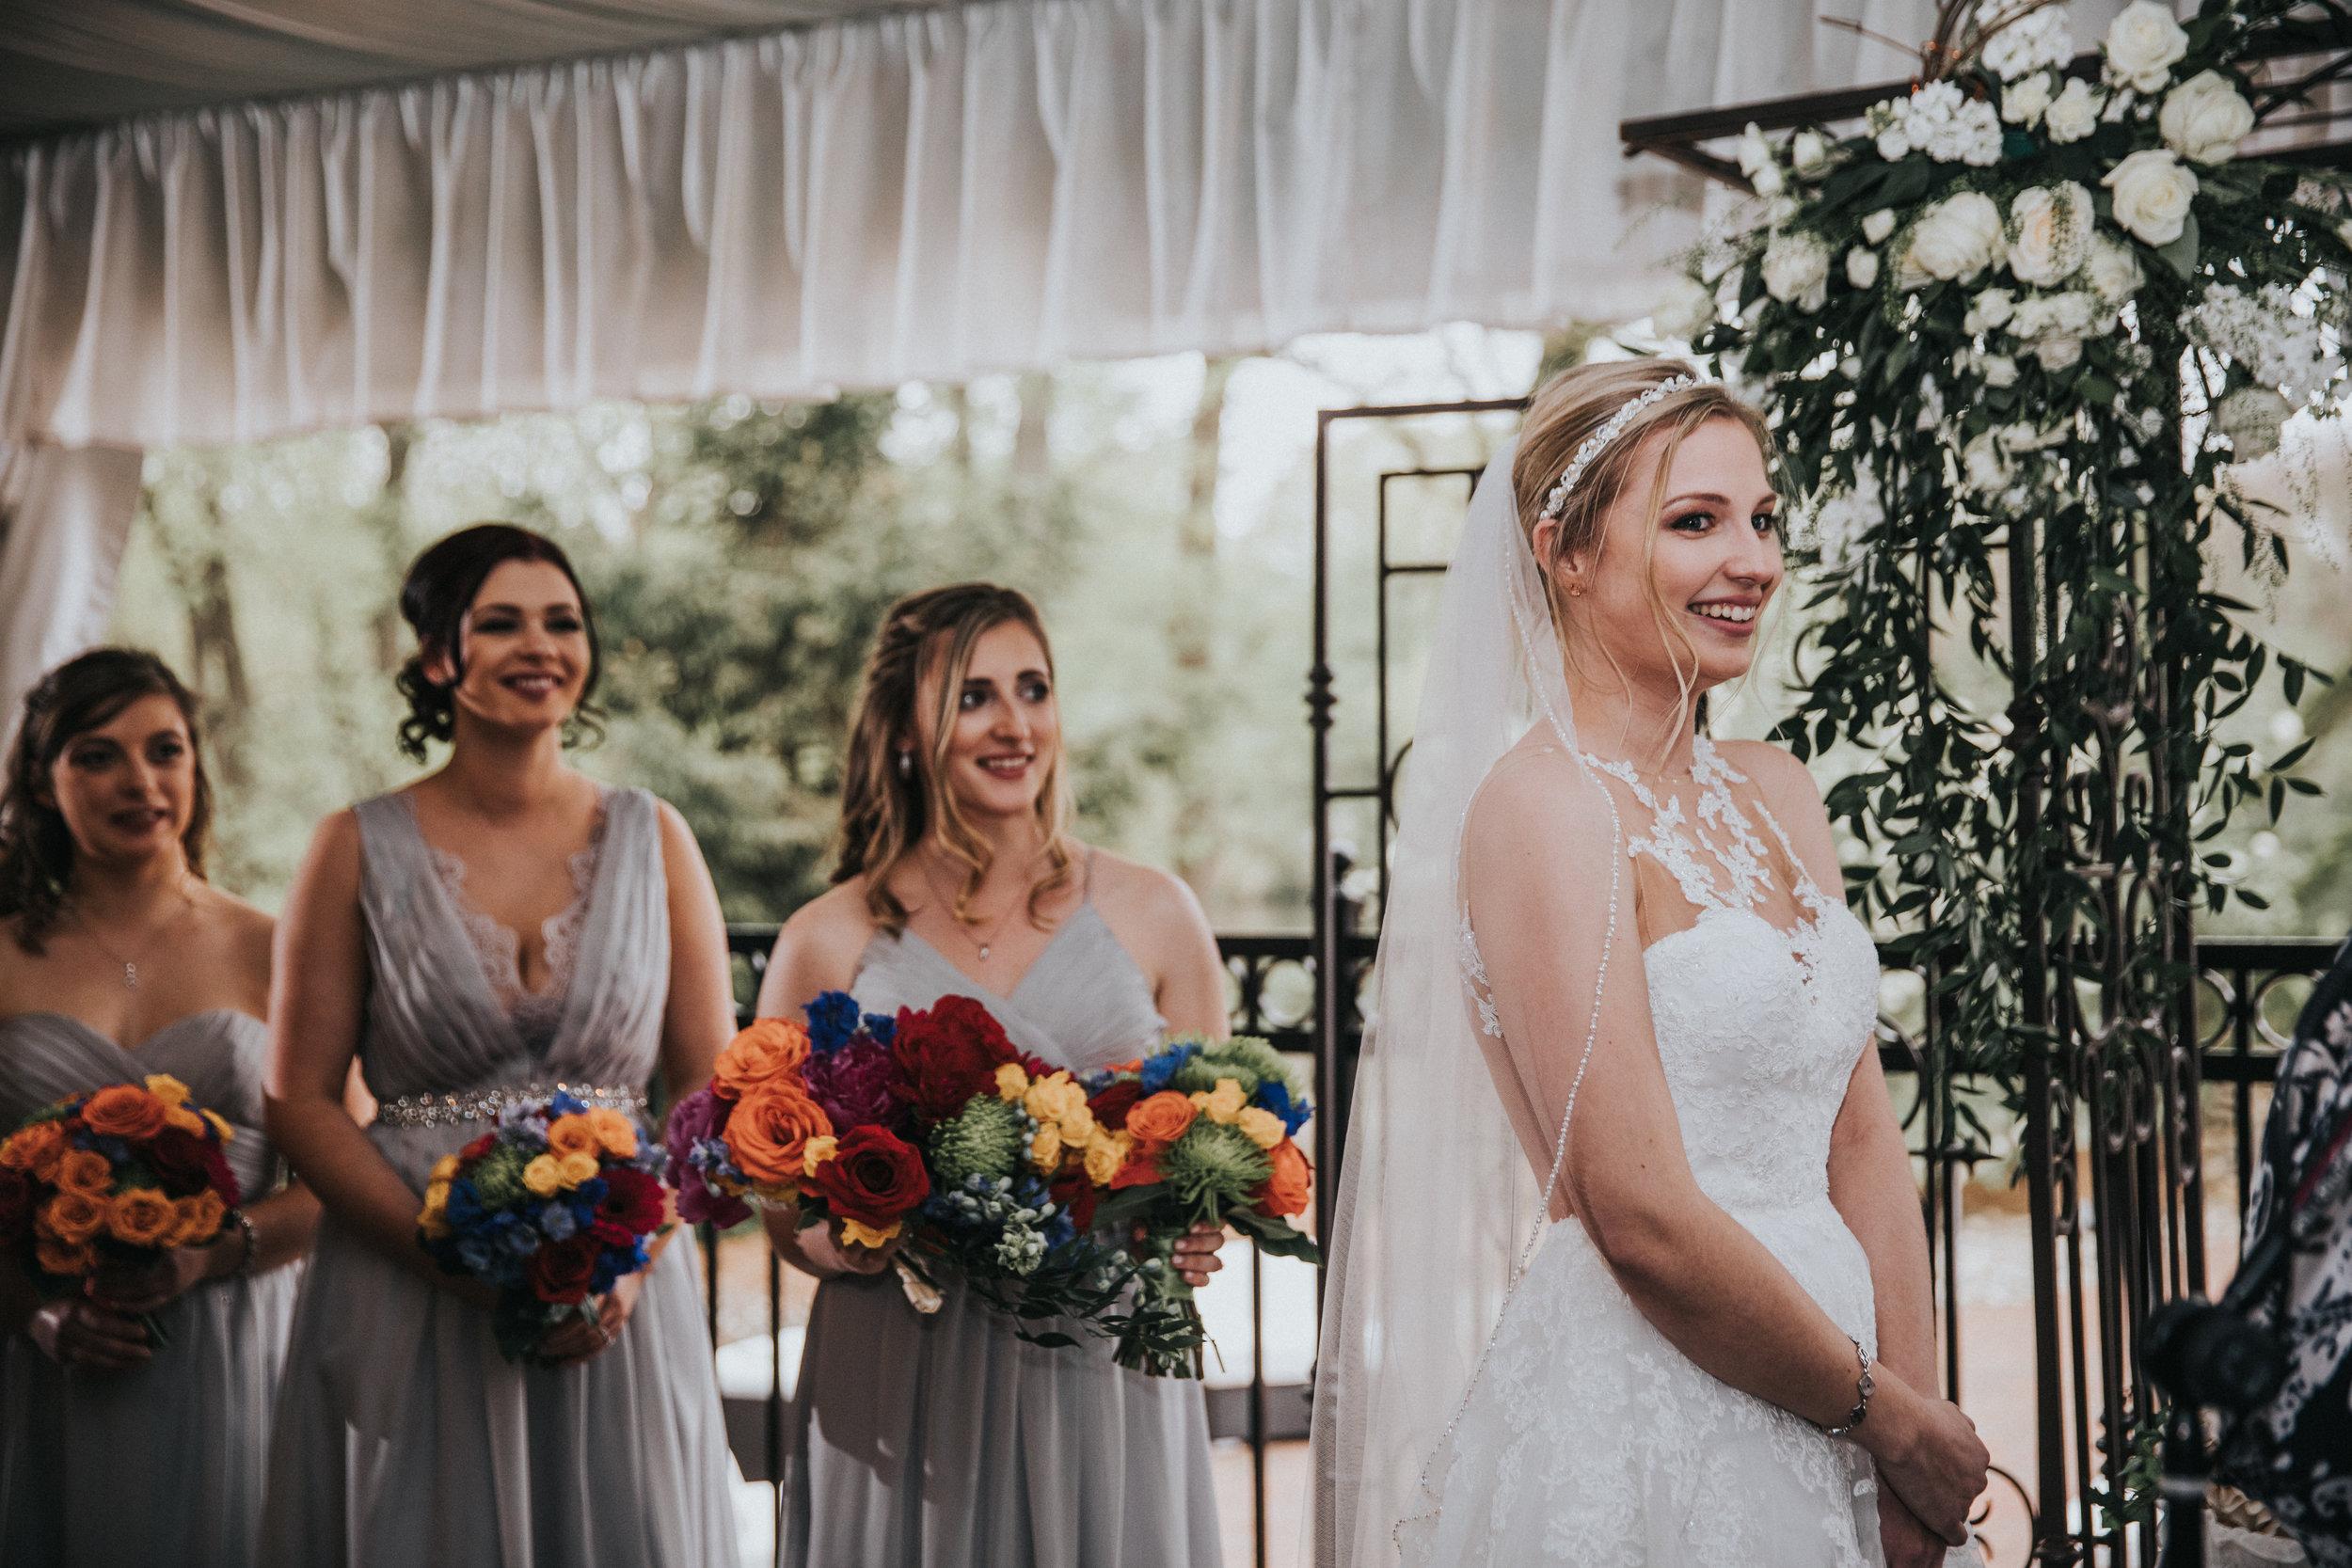 New-Jersey-Wedding-Photographer-Megan&Nick-Ceremony-101.jpg